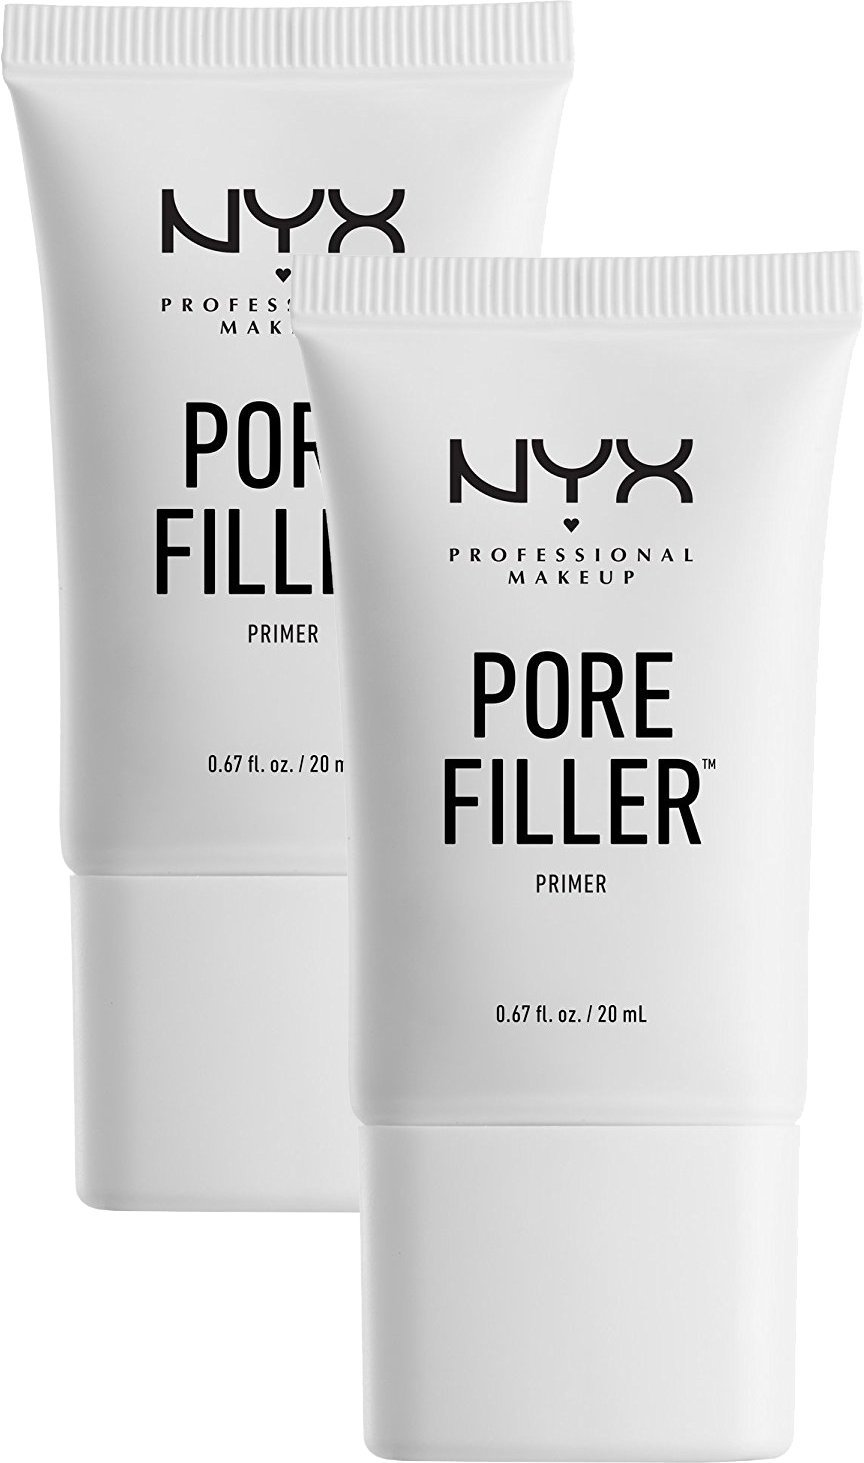 Lot de 2 bouche-pores NYX Primer - Base de maquillage - 2x 20ml NYX Cosmetics